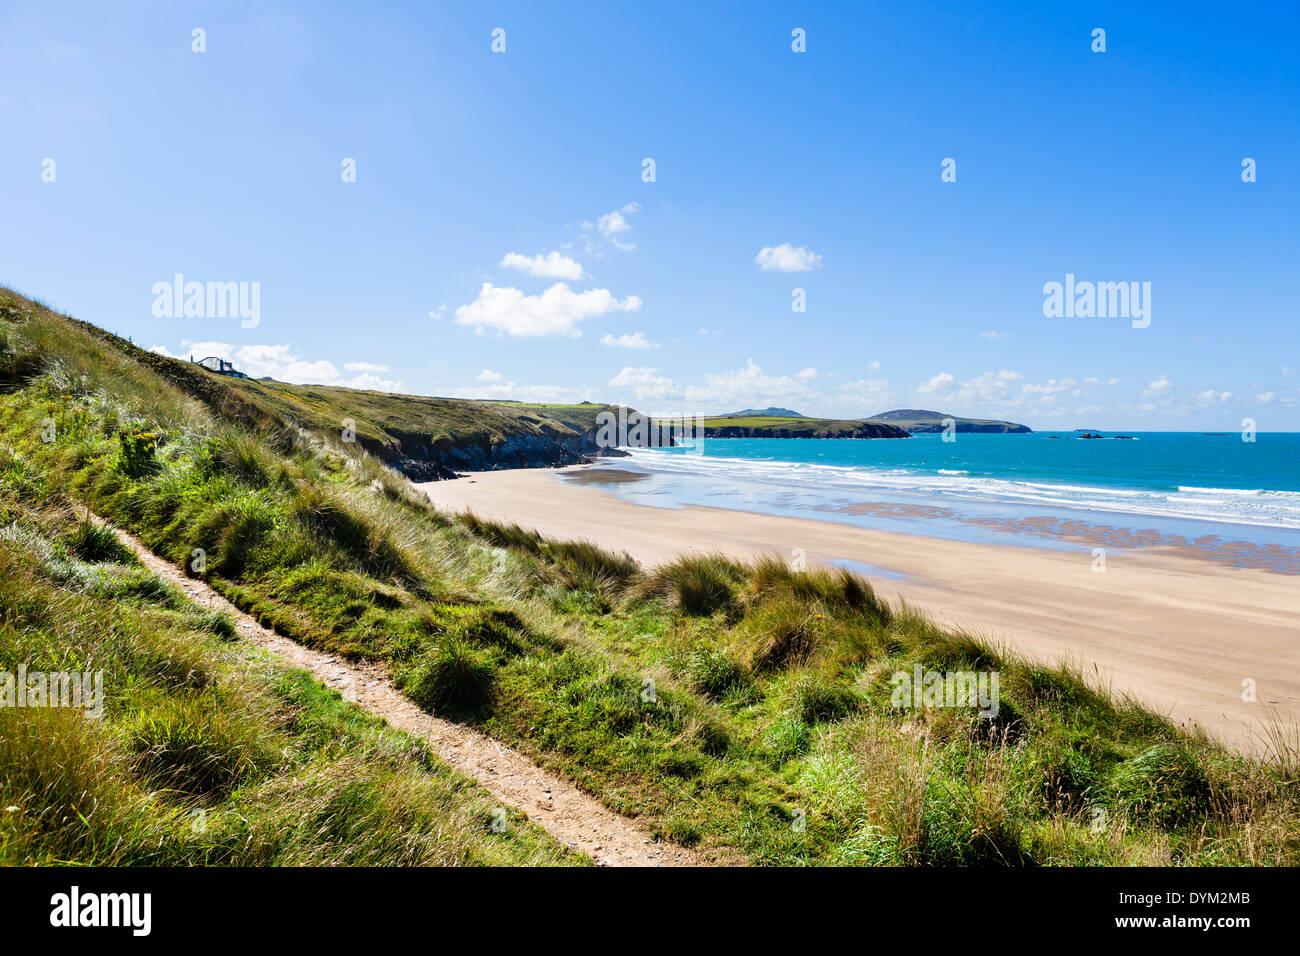 Pembrokeshire Coast Path alongside Whitesands Beach near St David's, Pembrokeshire, Wales, UK - Stock Image